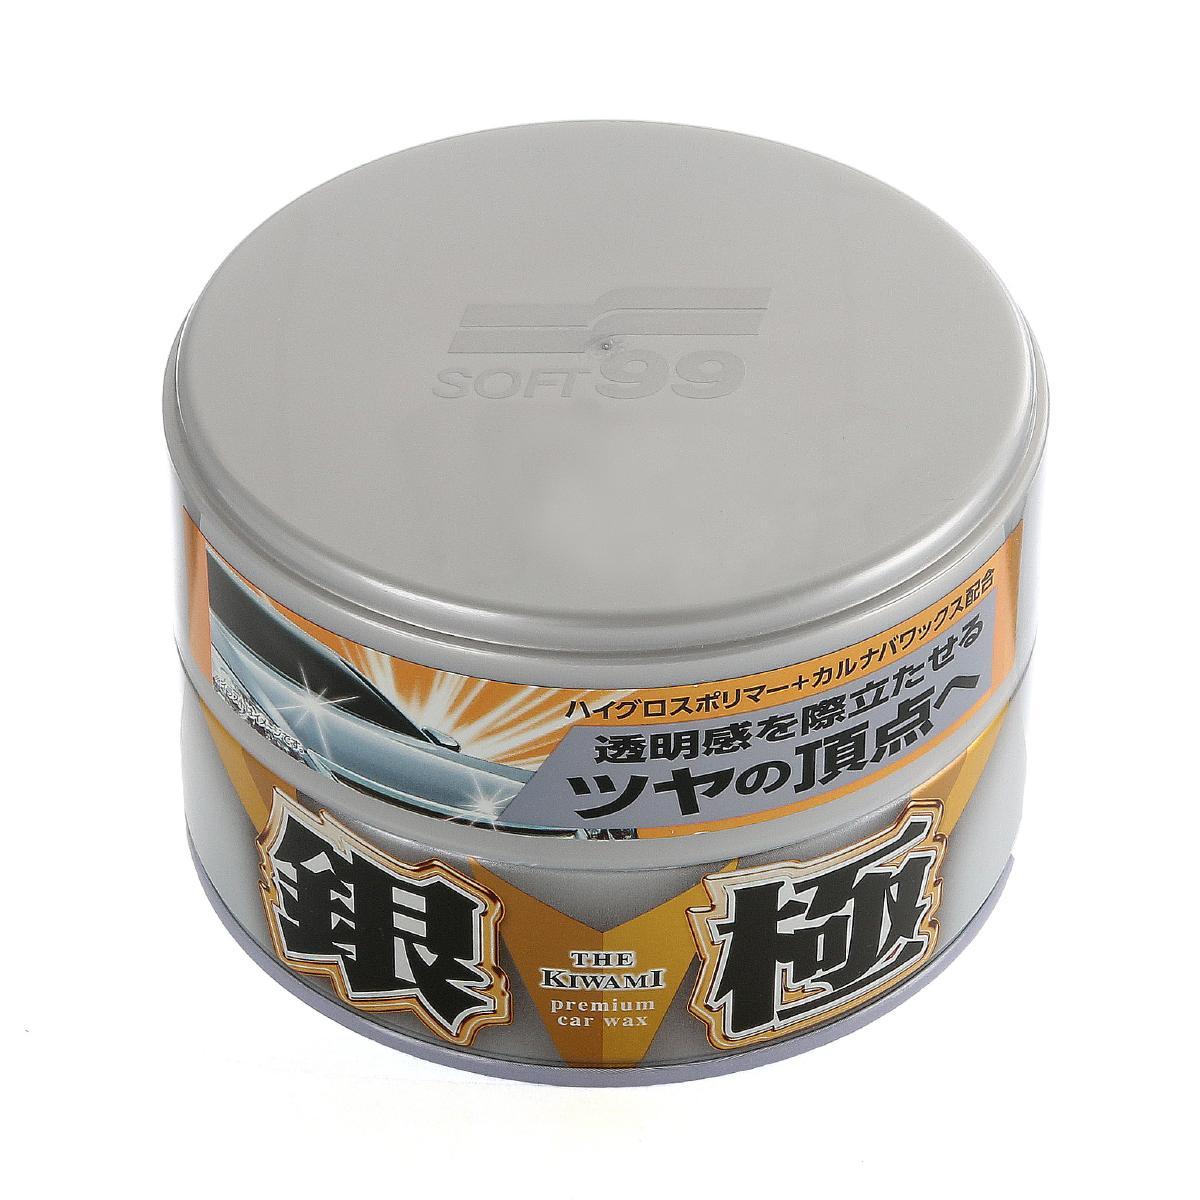 Bilvax Soft99 Extreme Gloss Wax The Kiwami Silver, 200 g